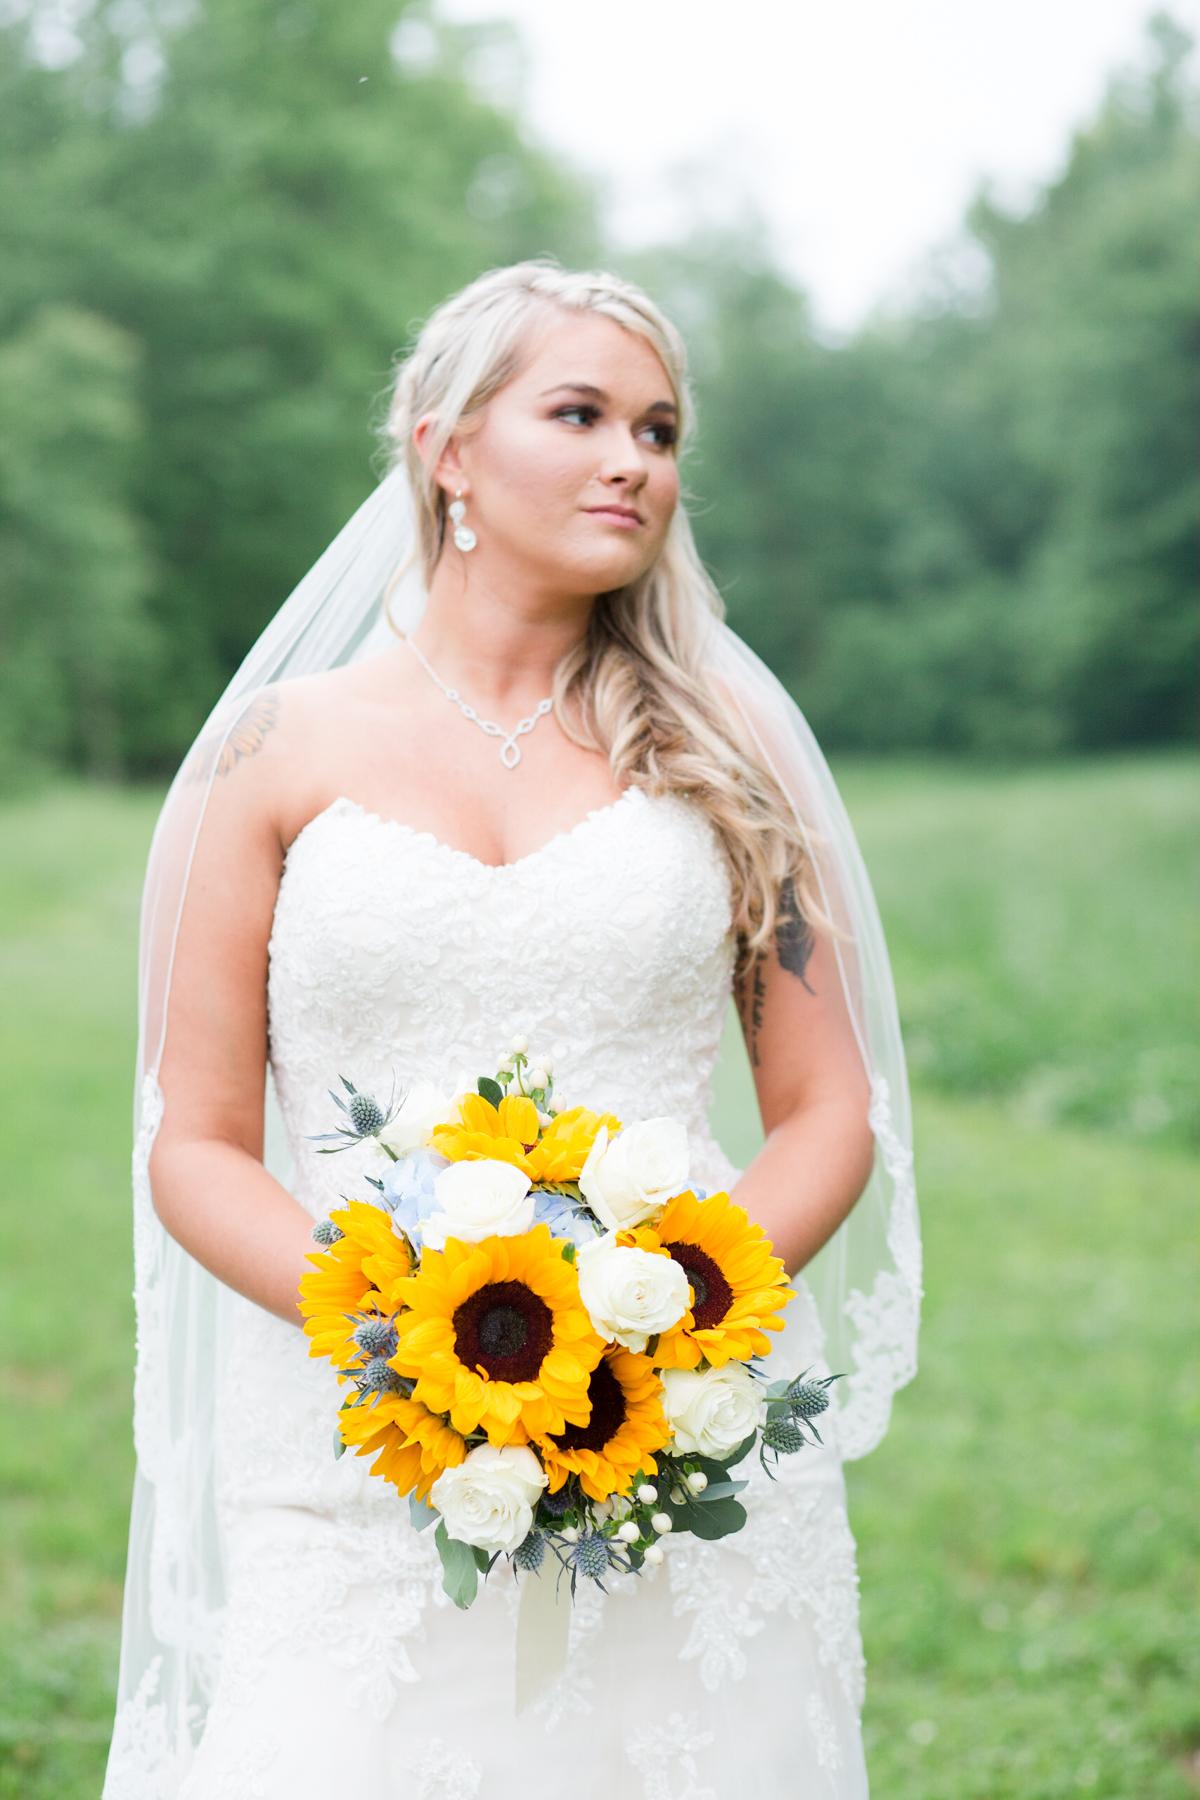 The-venue-at-white-oak-farms-wedding-nashville-wedding-photographers-0308.jpg